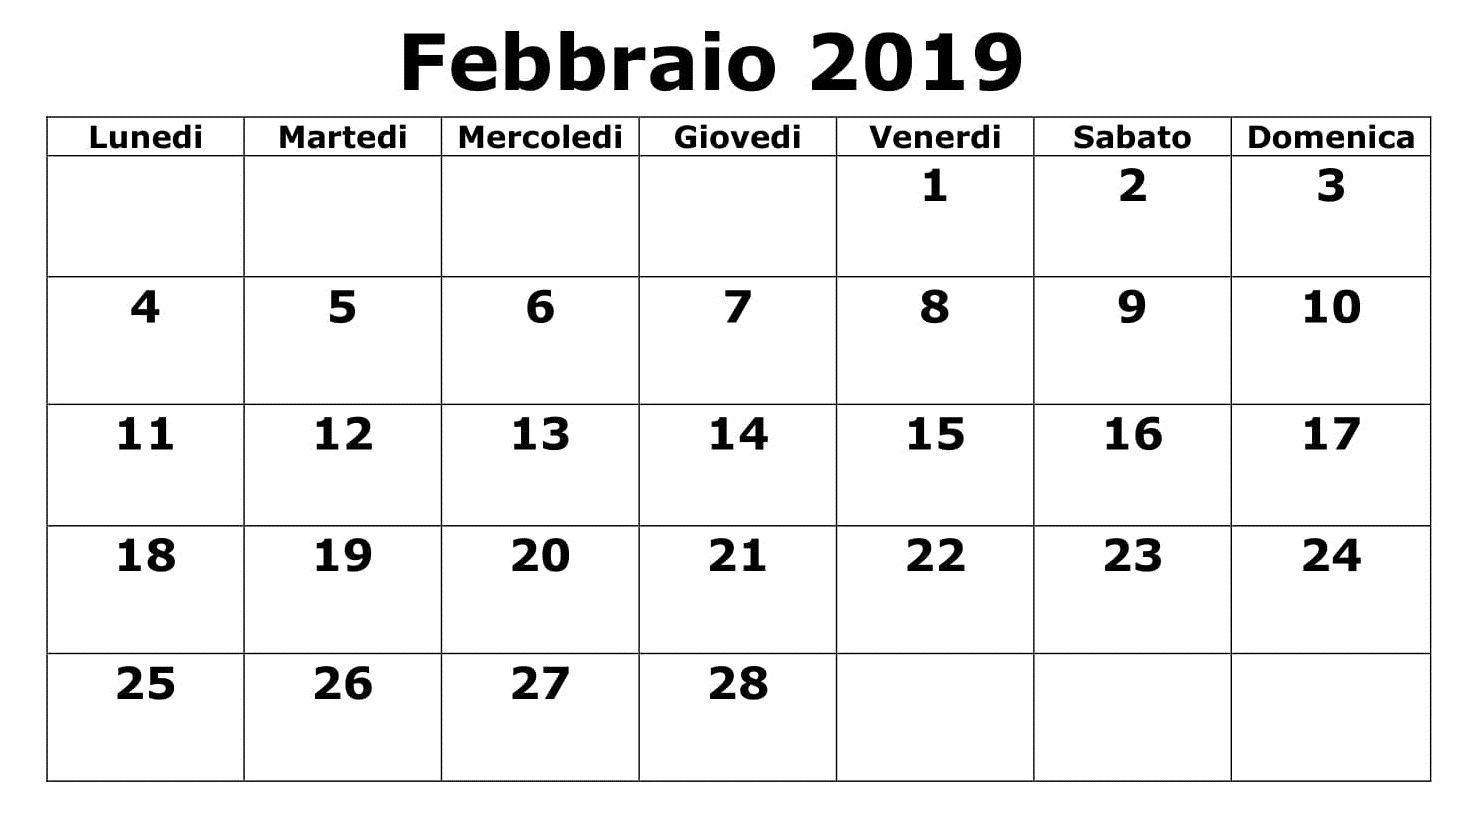 Calendario Con Note.Calendario Con Note 2019 Pdf Febbraio 125 February 2019